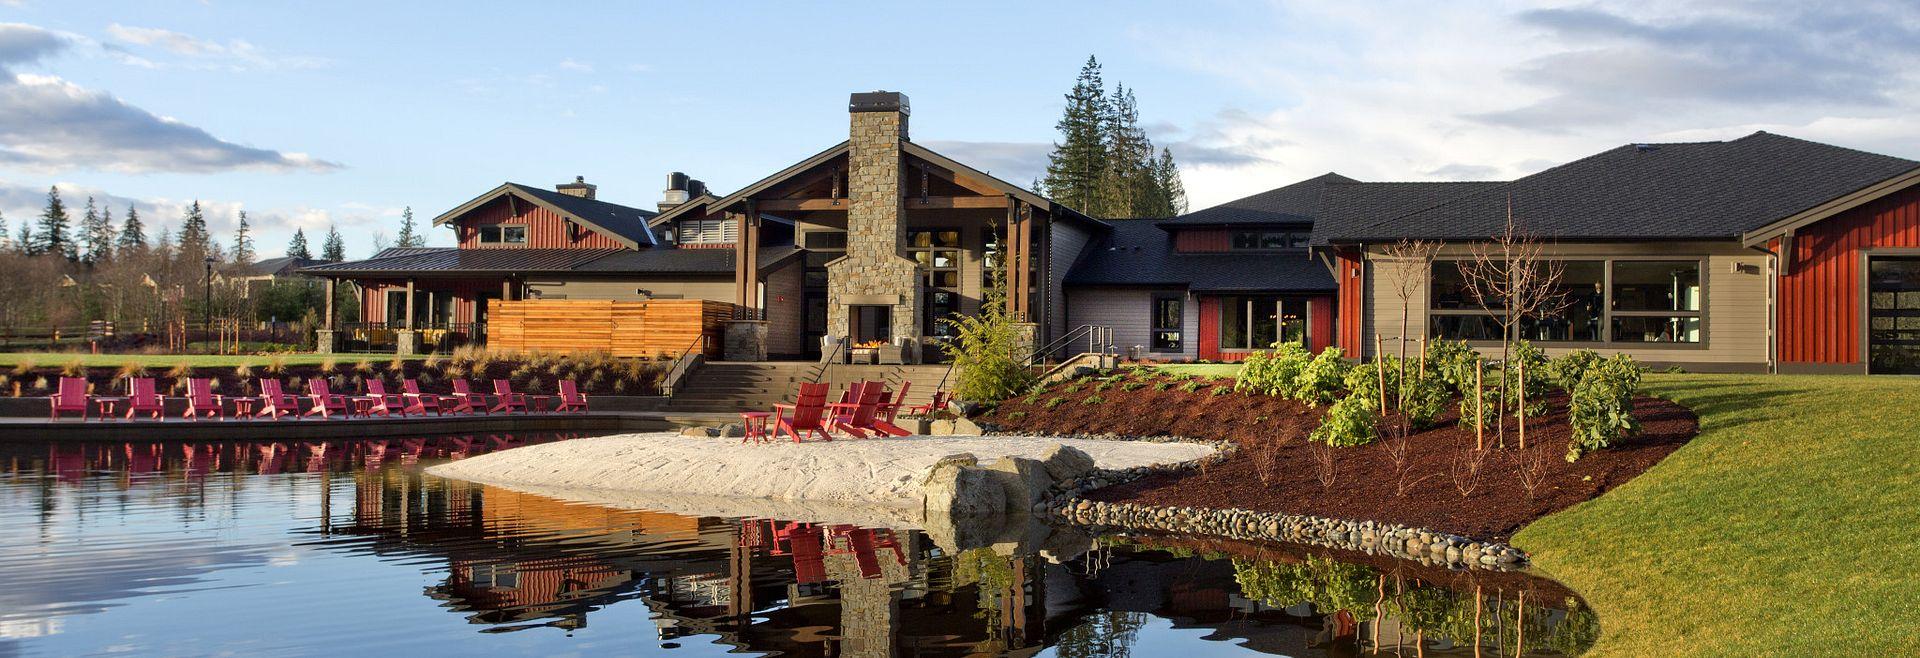 Tehlaeh Seven Summit Lodge